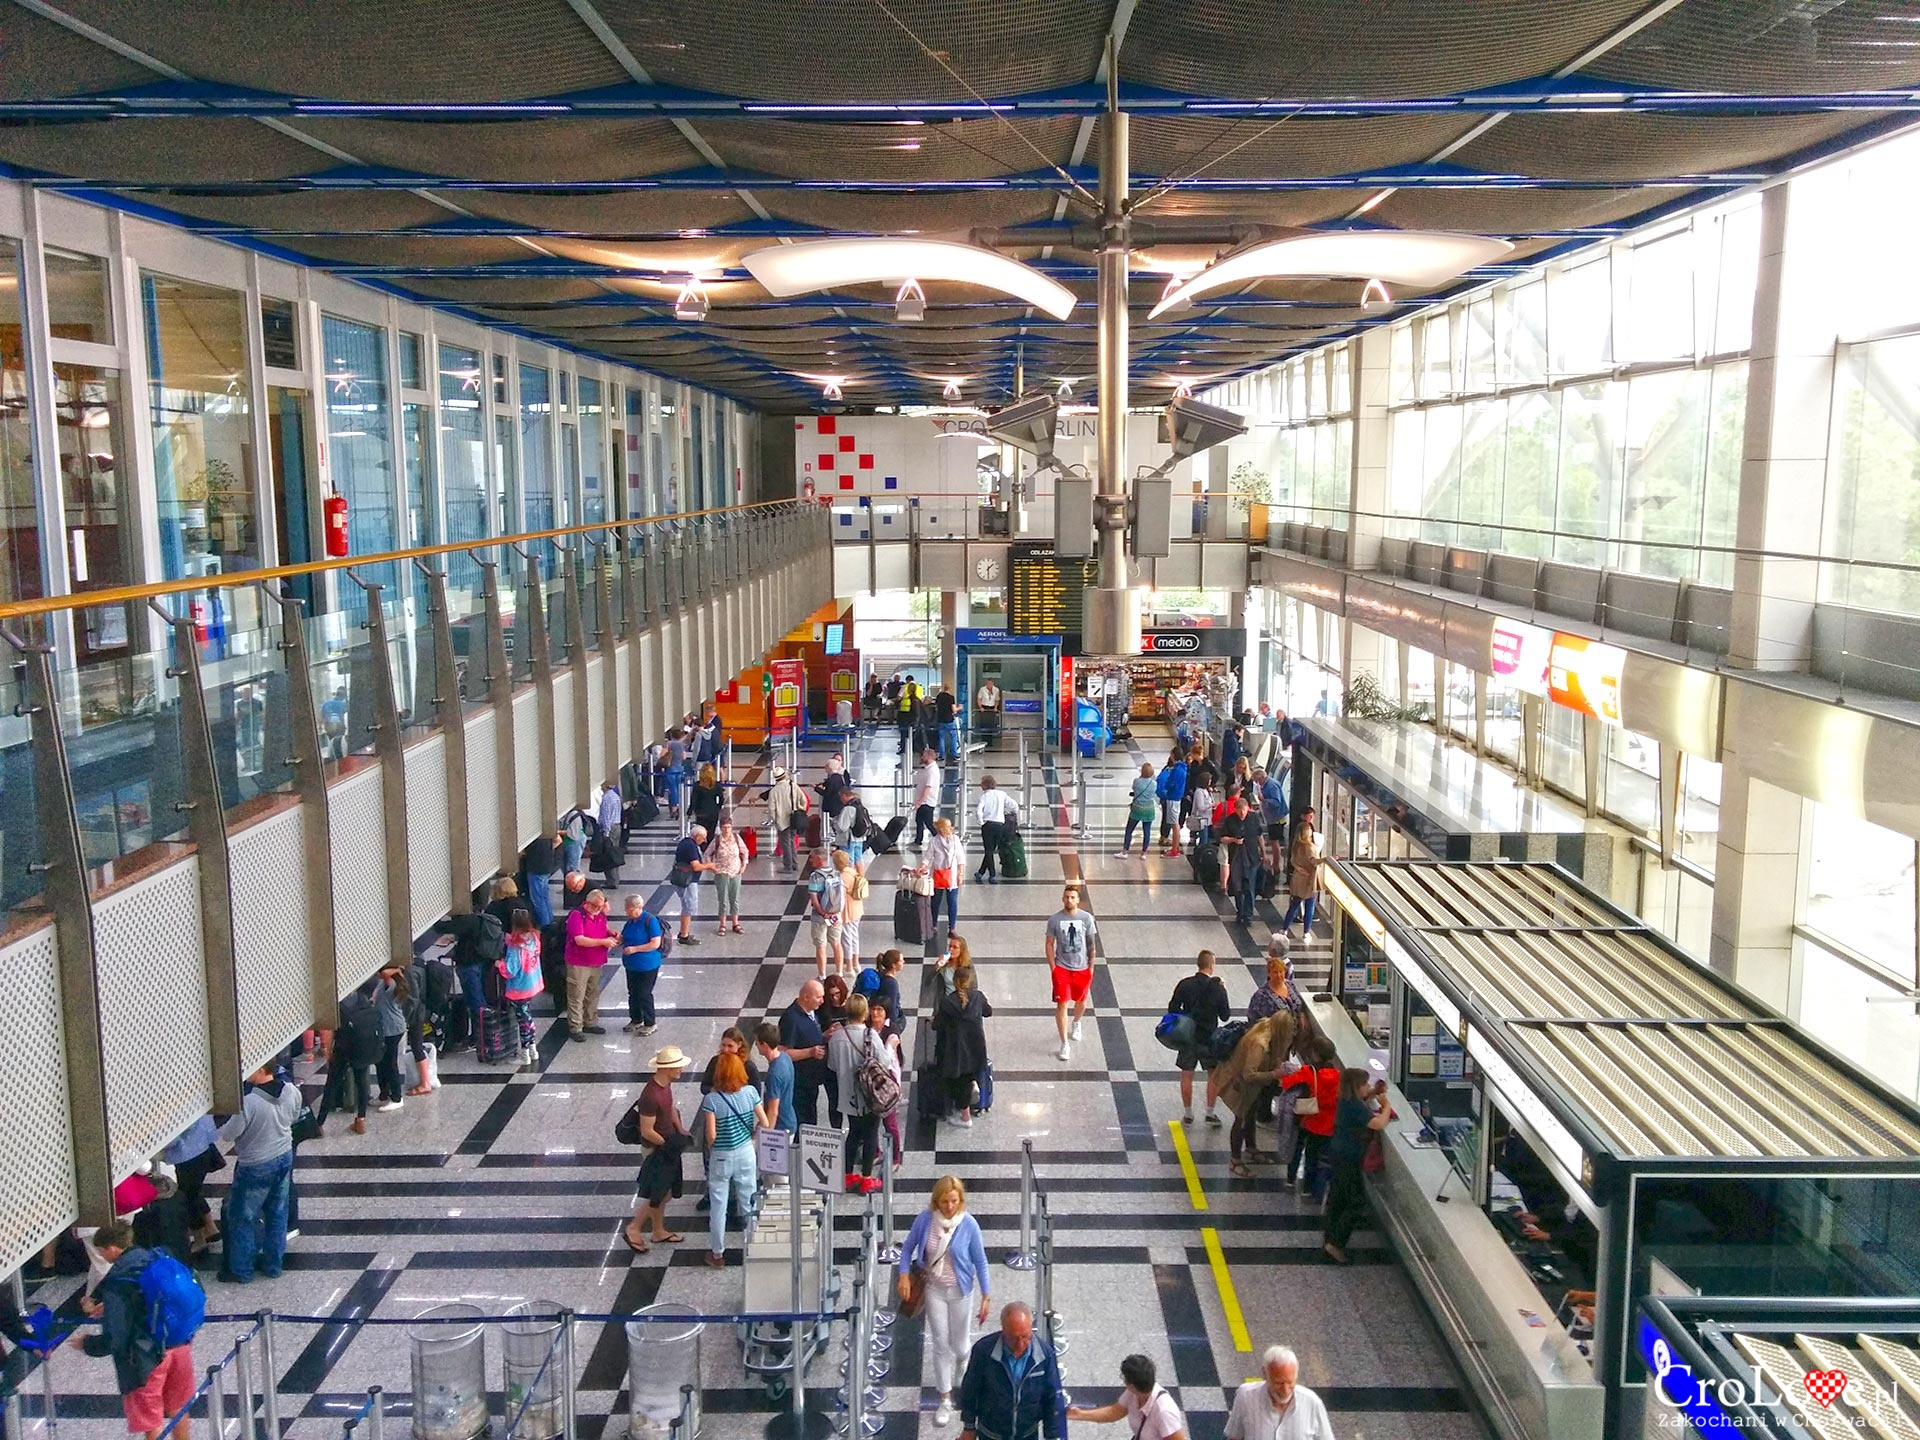 Port lotniczy Split (Kaštel Štafilić)